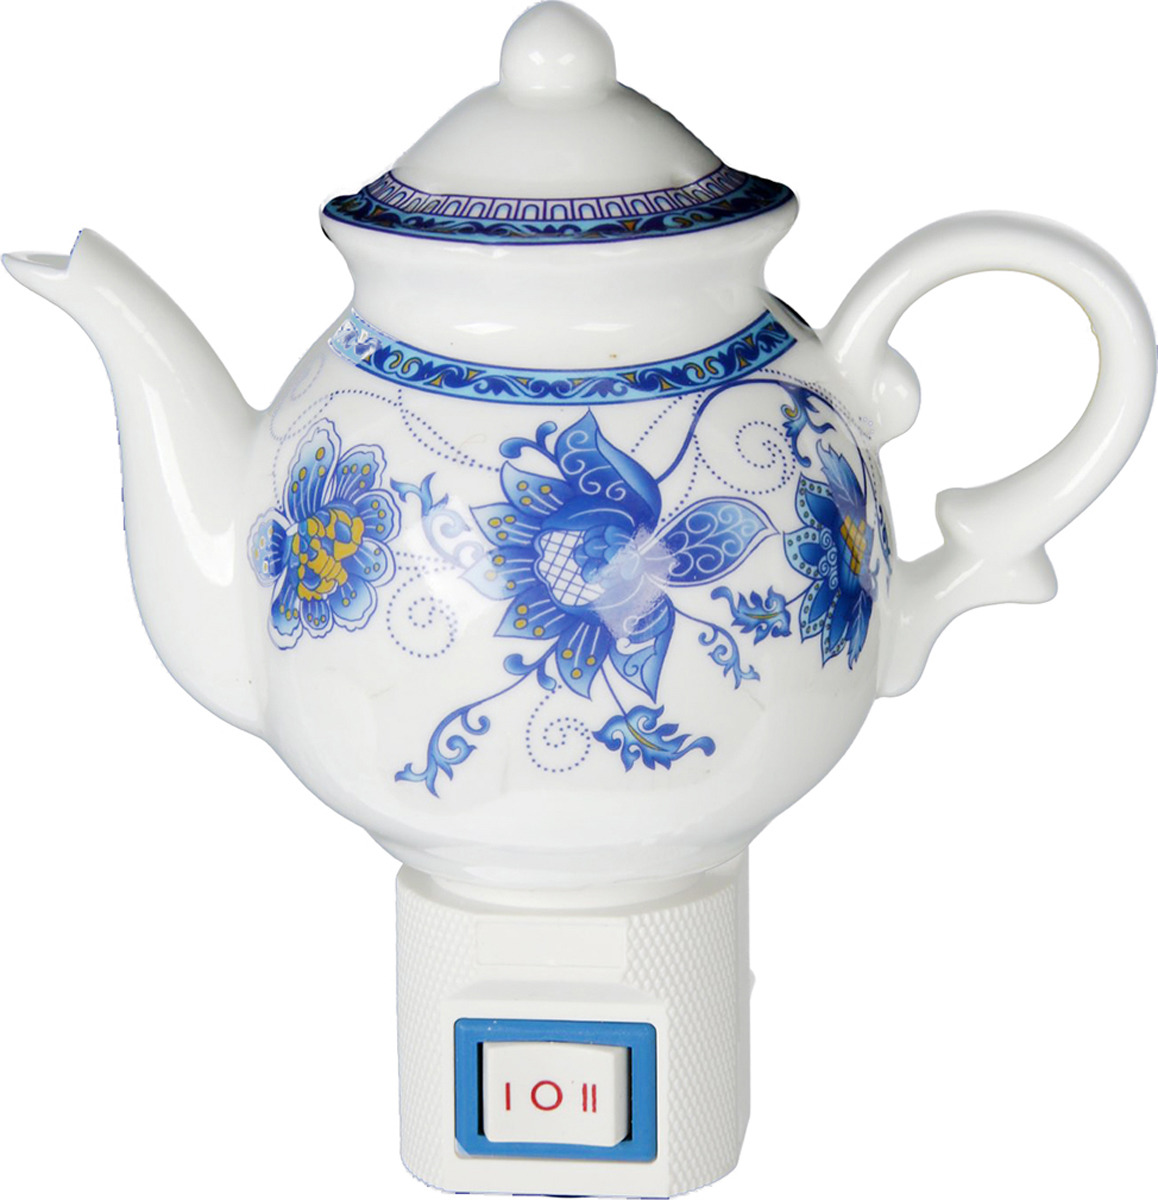 Ночник Risalux Чайничек Синие цветы, 15W, 1935356, белый, 11 х 6 х 13 см цена